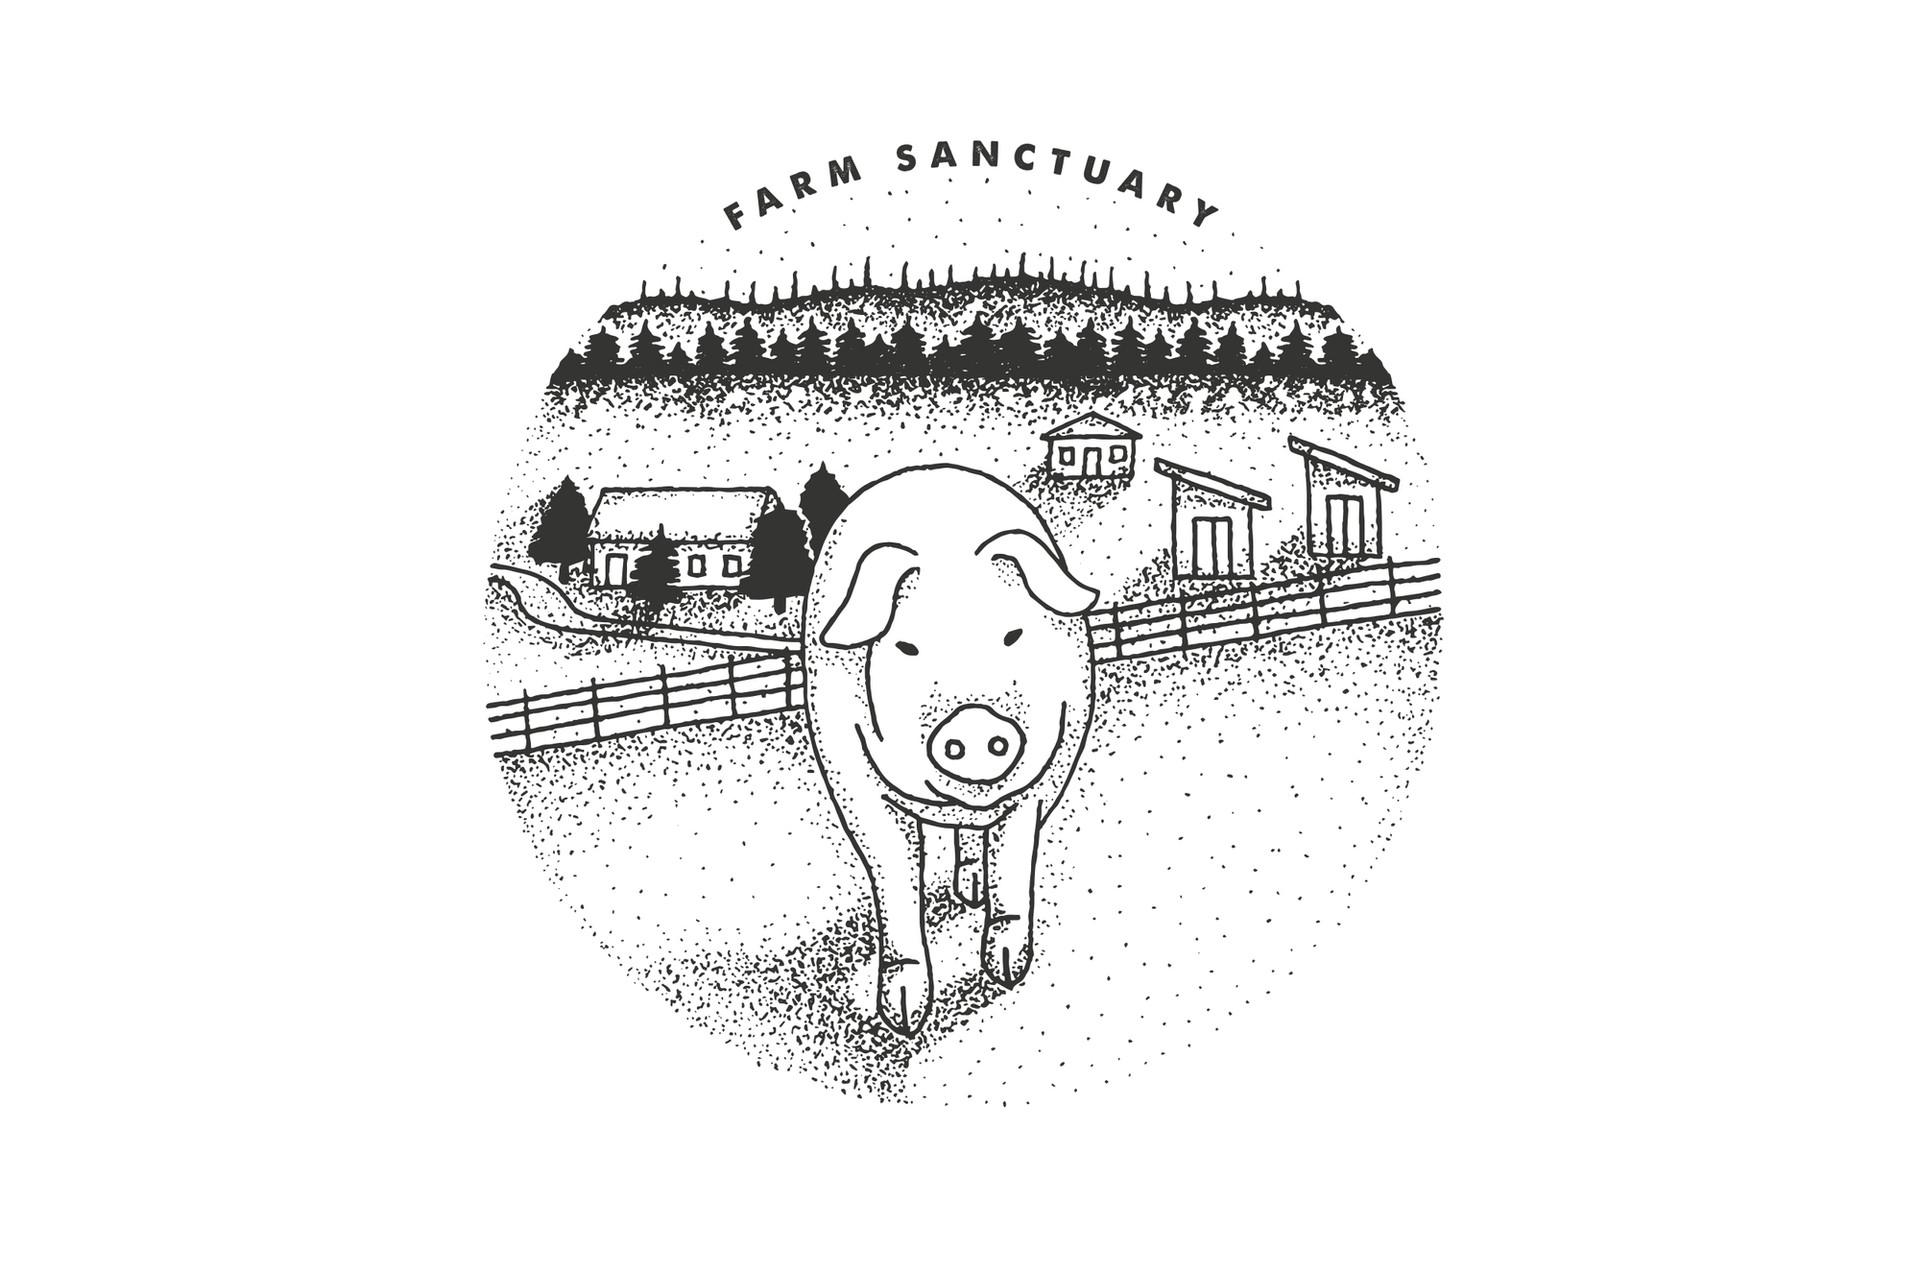 FARM-SANCTUARY_09.jpg